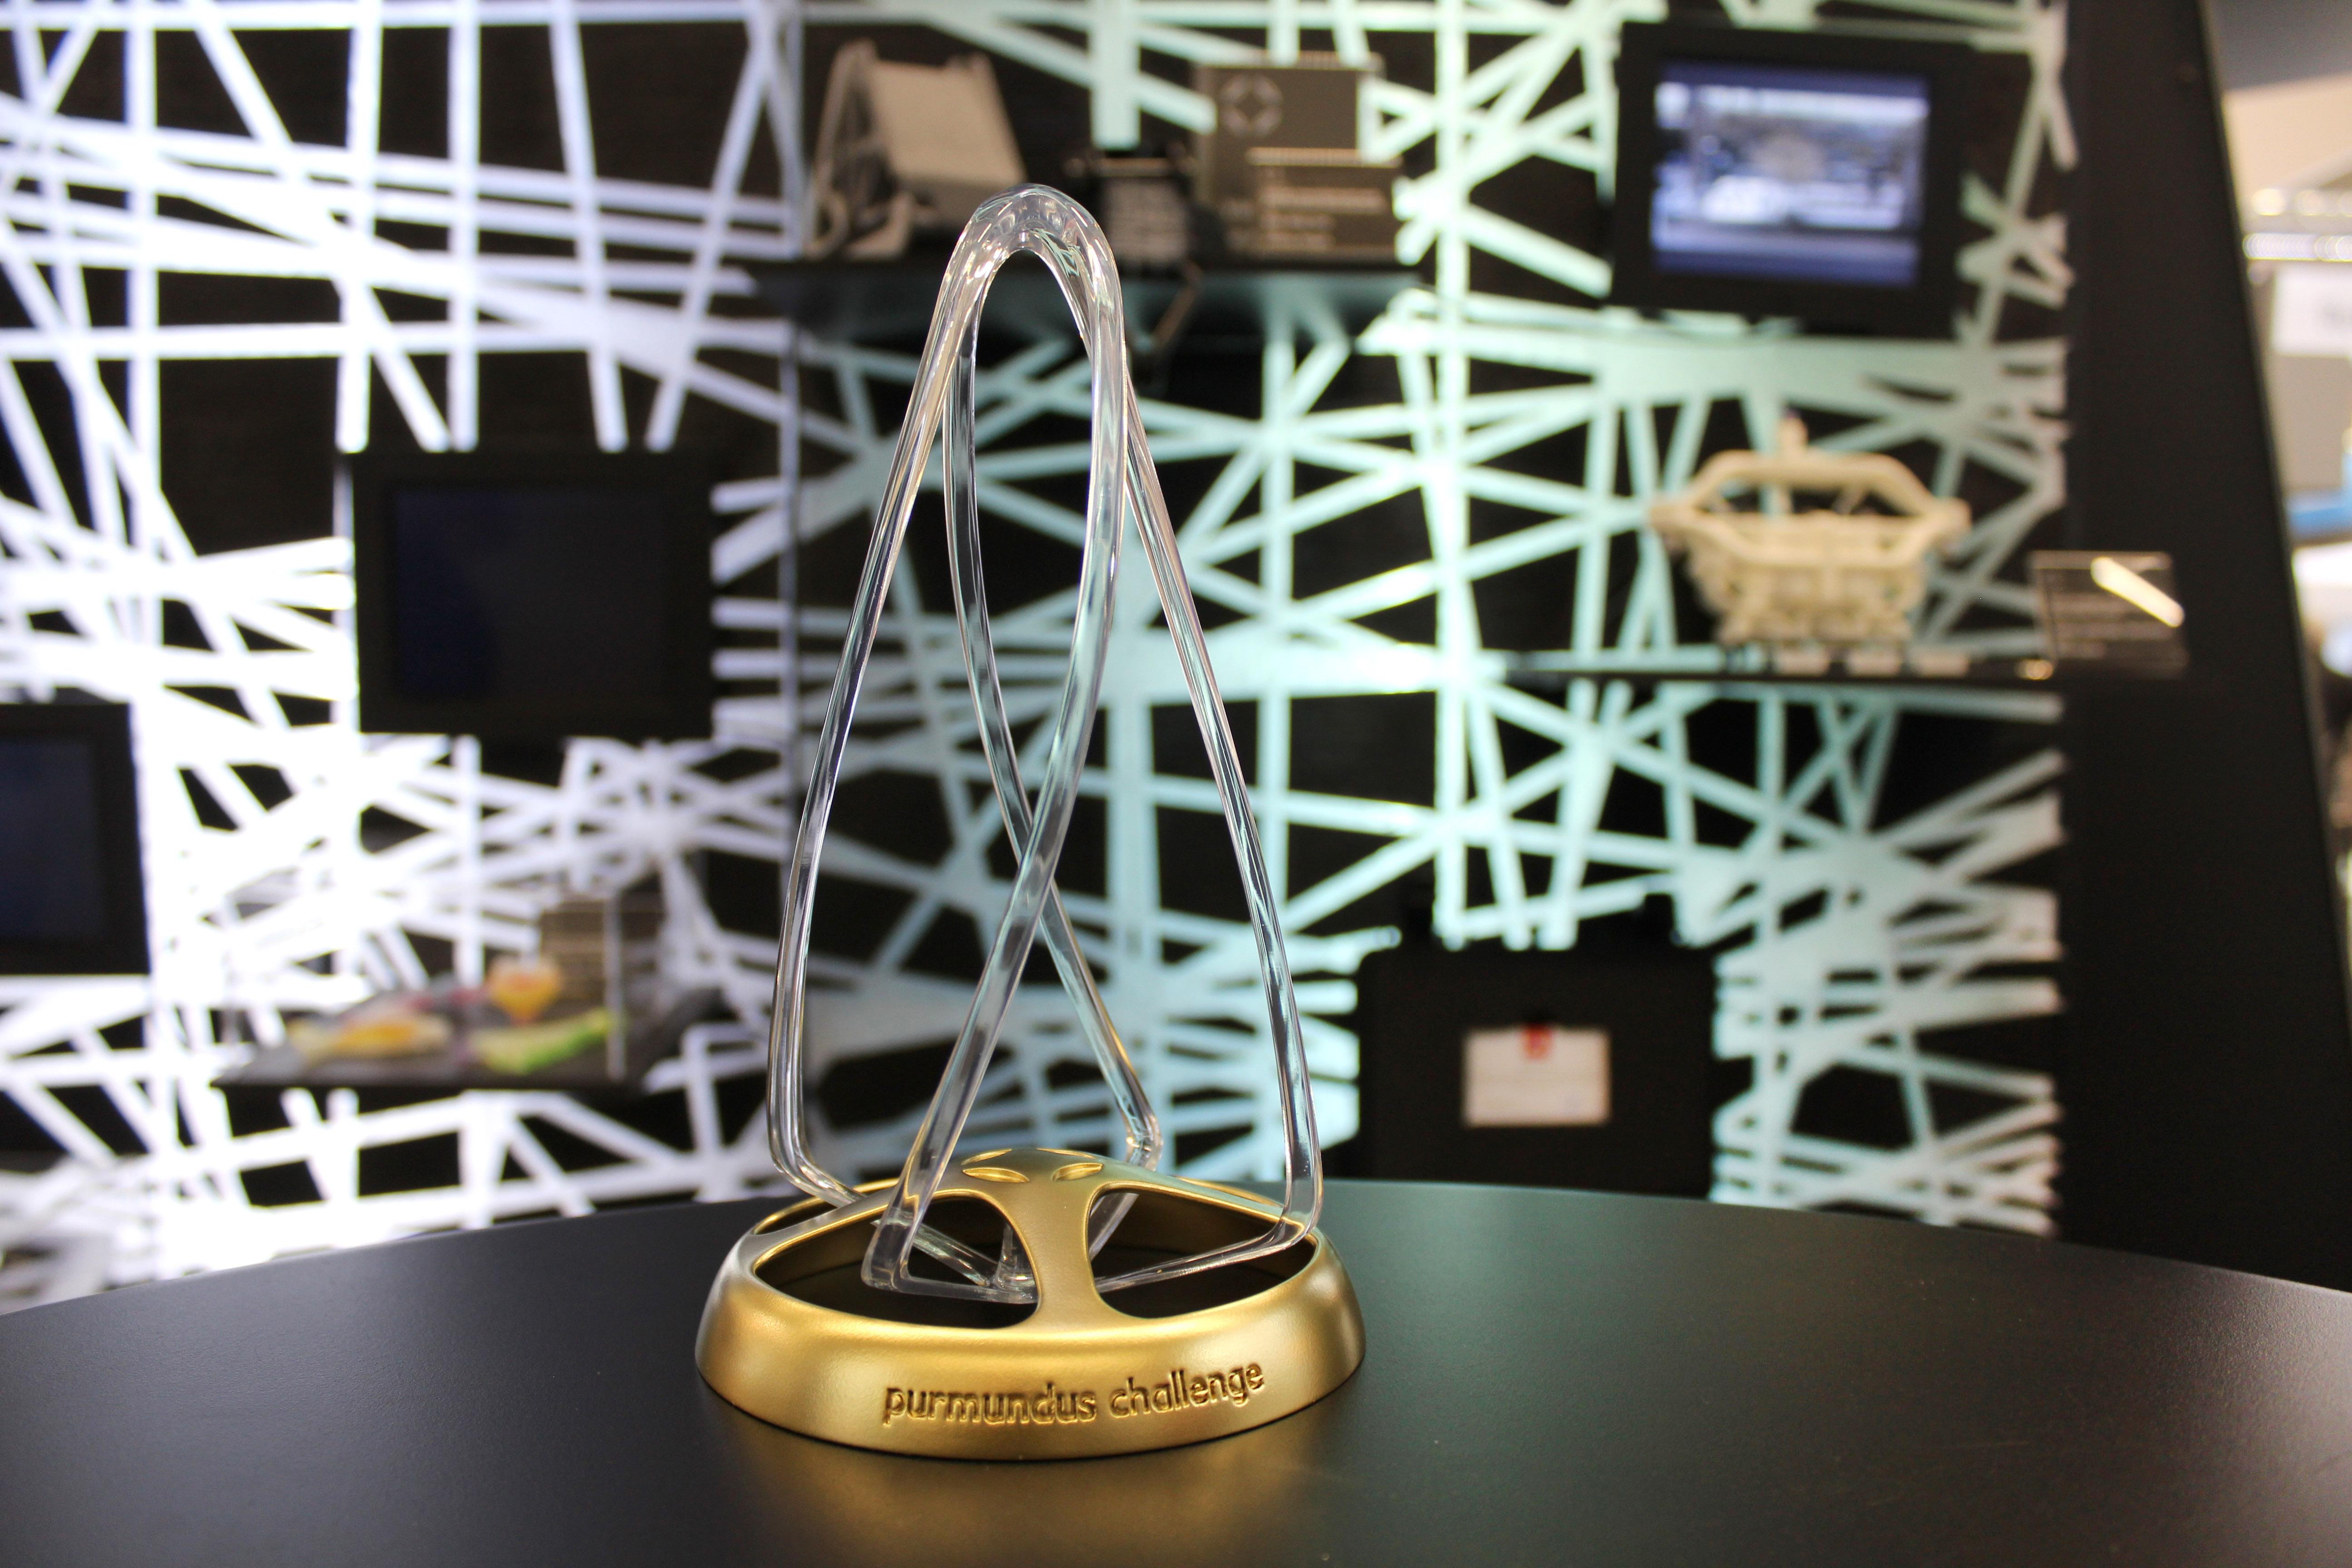 The purmundus challenge 2020 trophy. Photo via purmundus challenge.